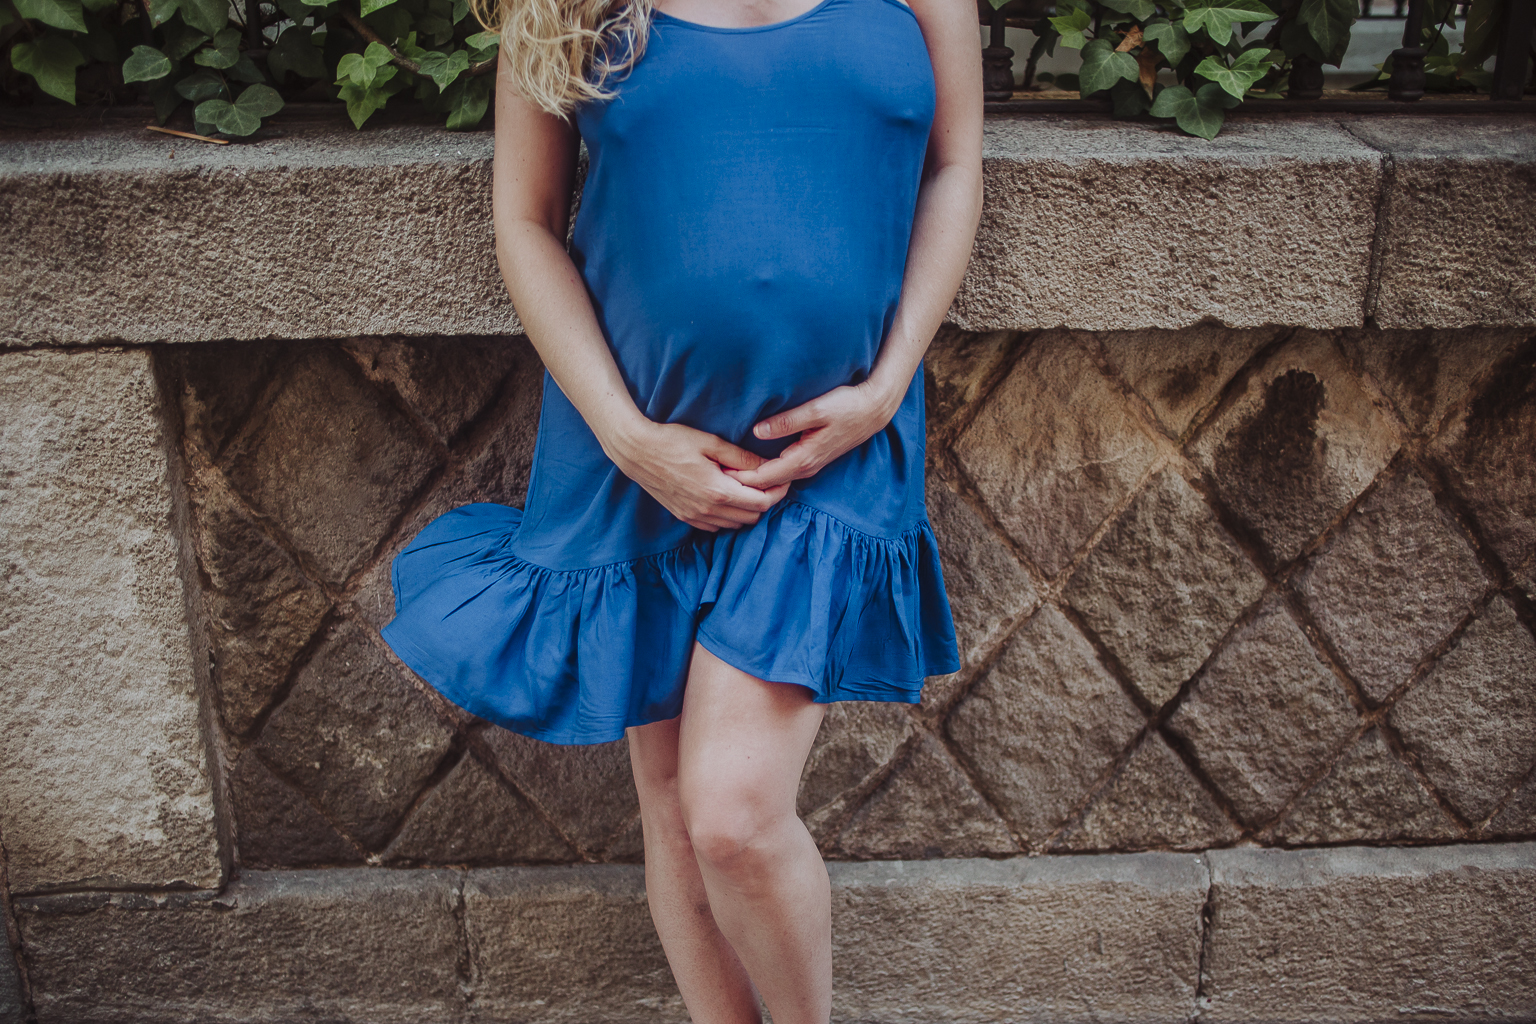 fotógrafo de embarazo :: fotógrafo de embarazadas Barcelona :: Fotografía de embarazo natural :: fotógrafo barcelona